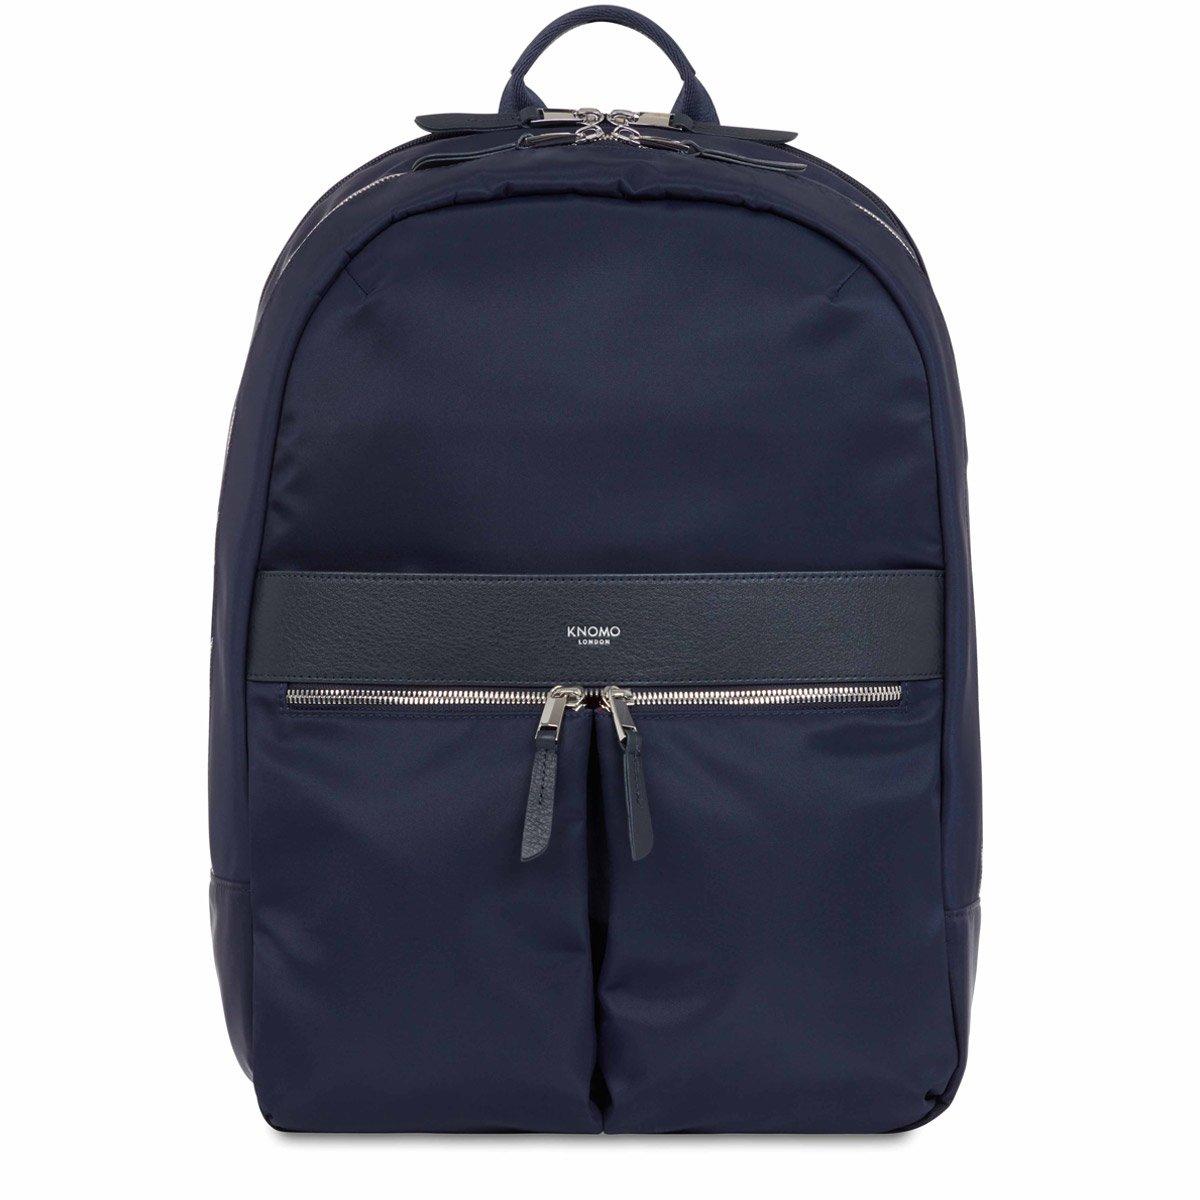 Laptop rugzak Knomo Laptop Rugzak 15 inch Mayfair Beaufort Donkerblauw Zilver